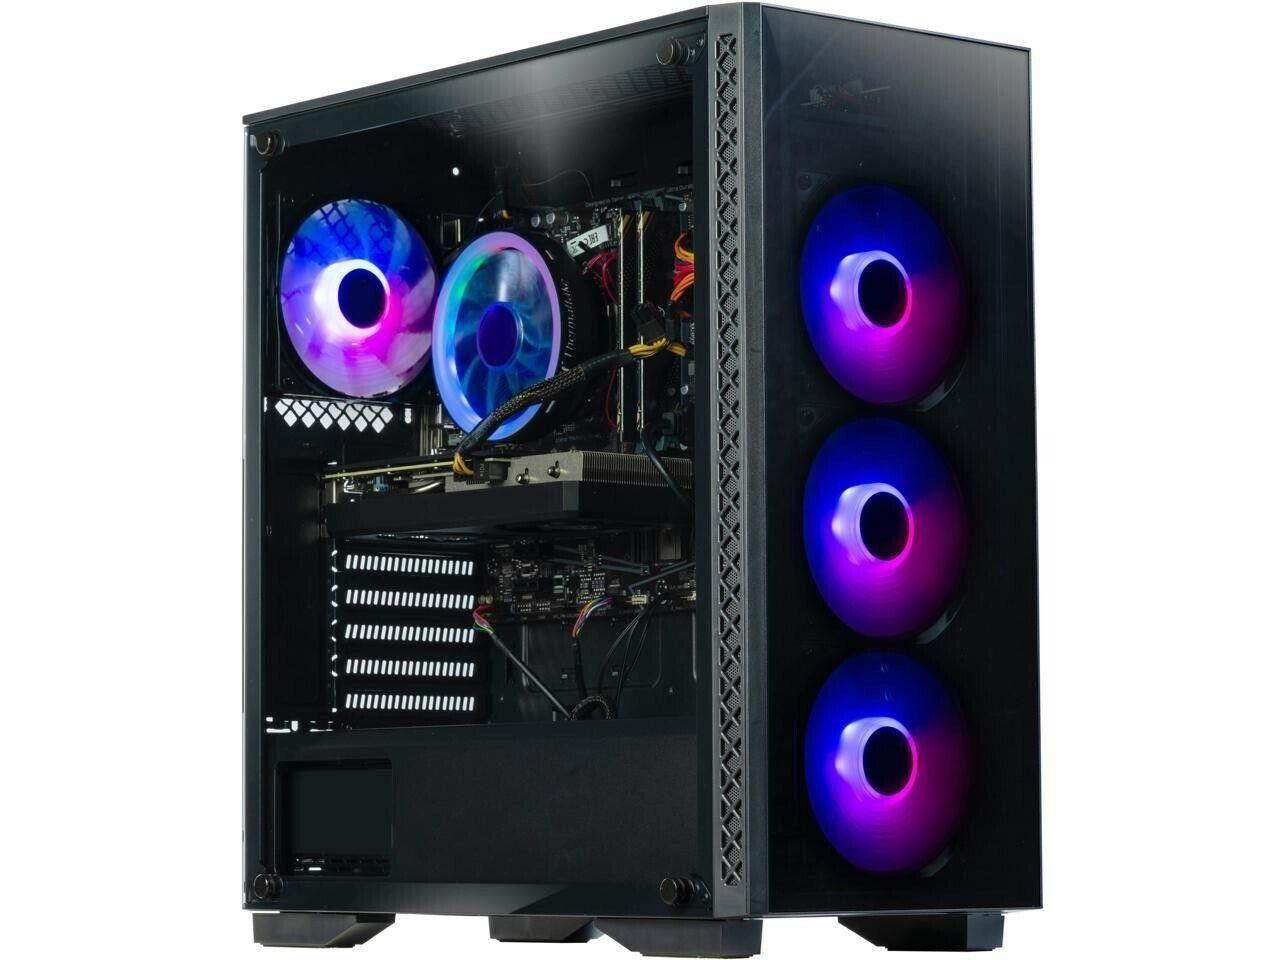 ABS Master Gaming PC - Intel i5 10400F - 16GB DDR4 - 512GB NO 3060 TI